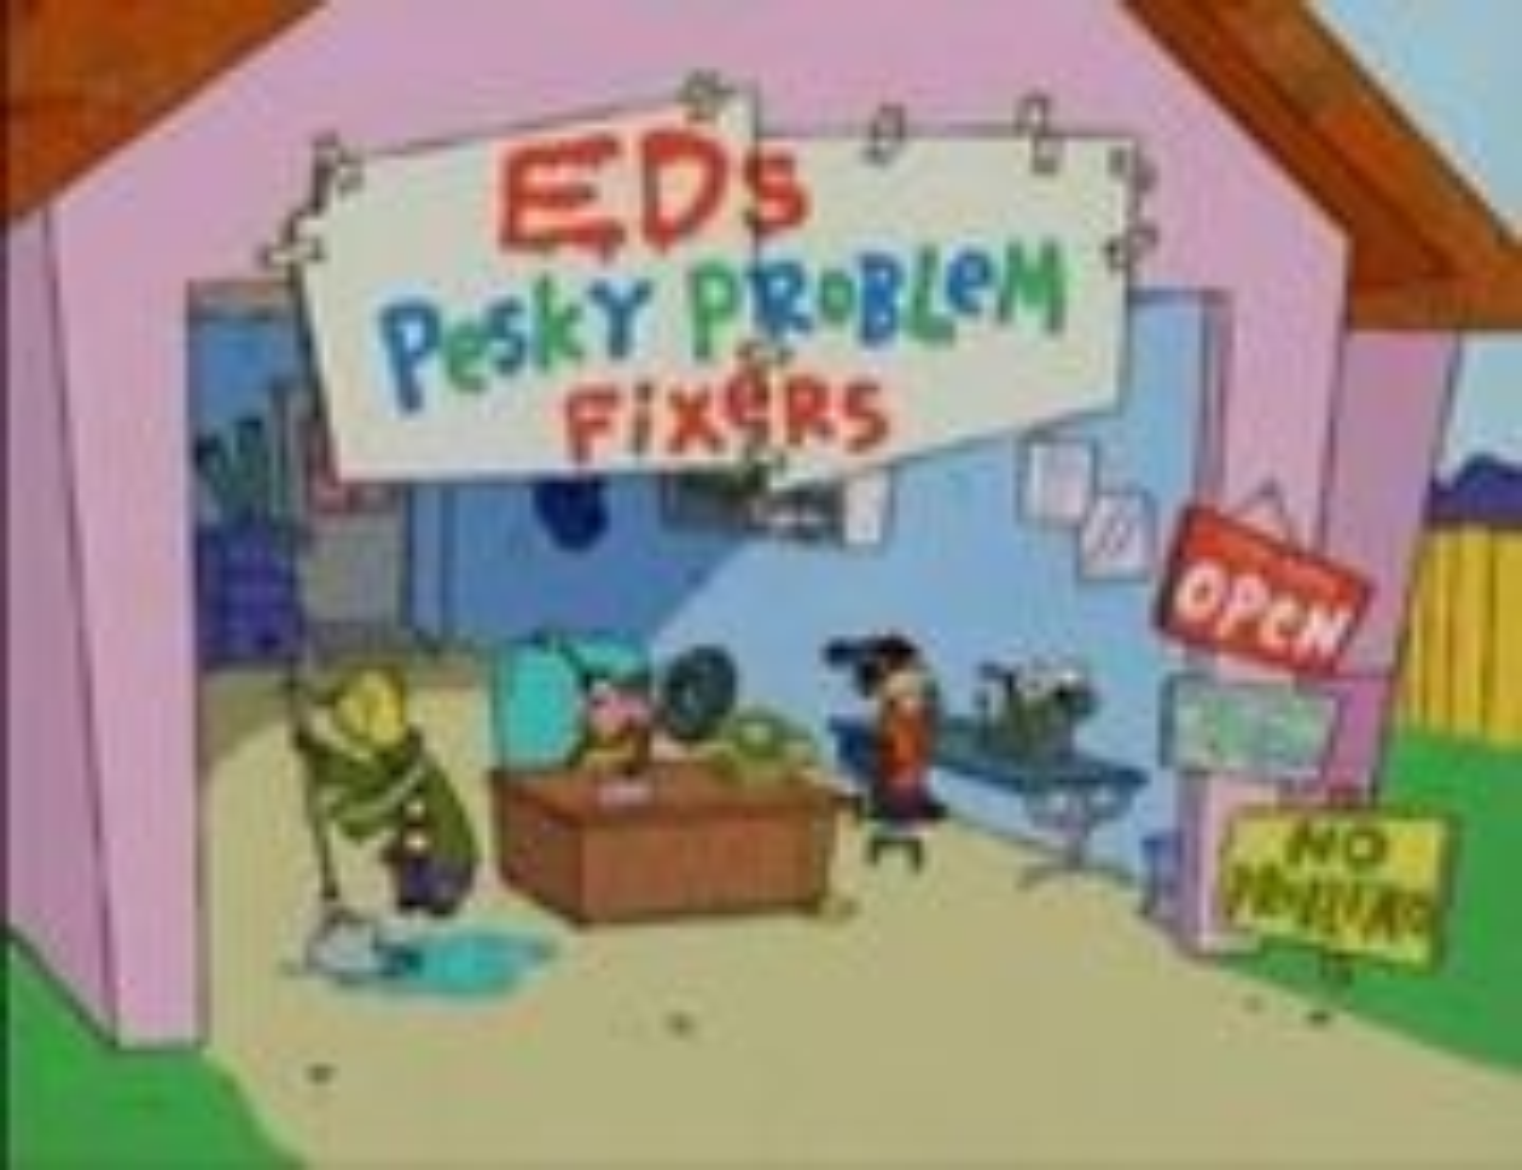 ED EDD N EDDY's Pesky Problem Fixers